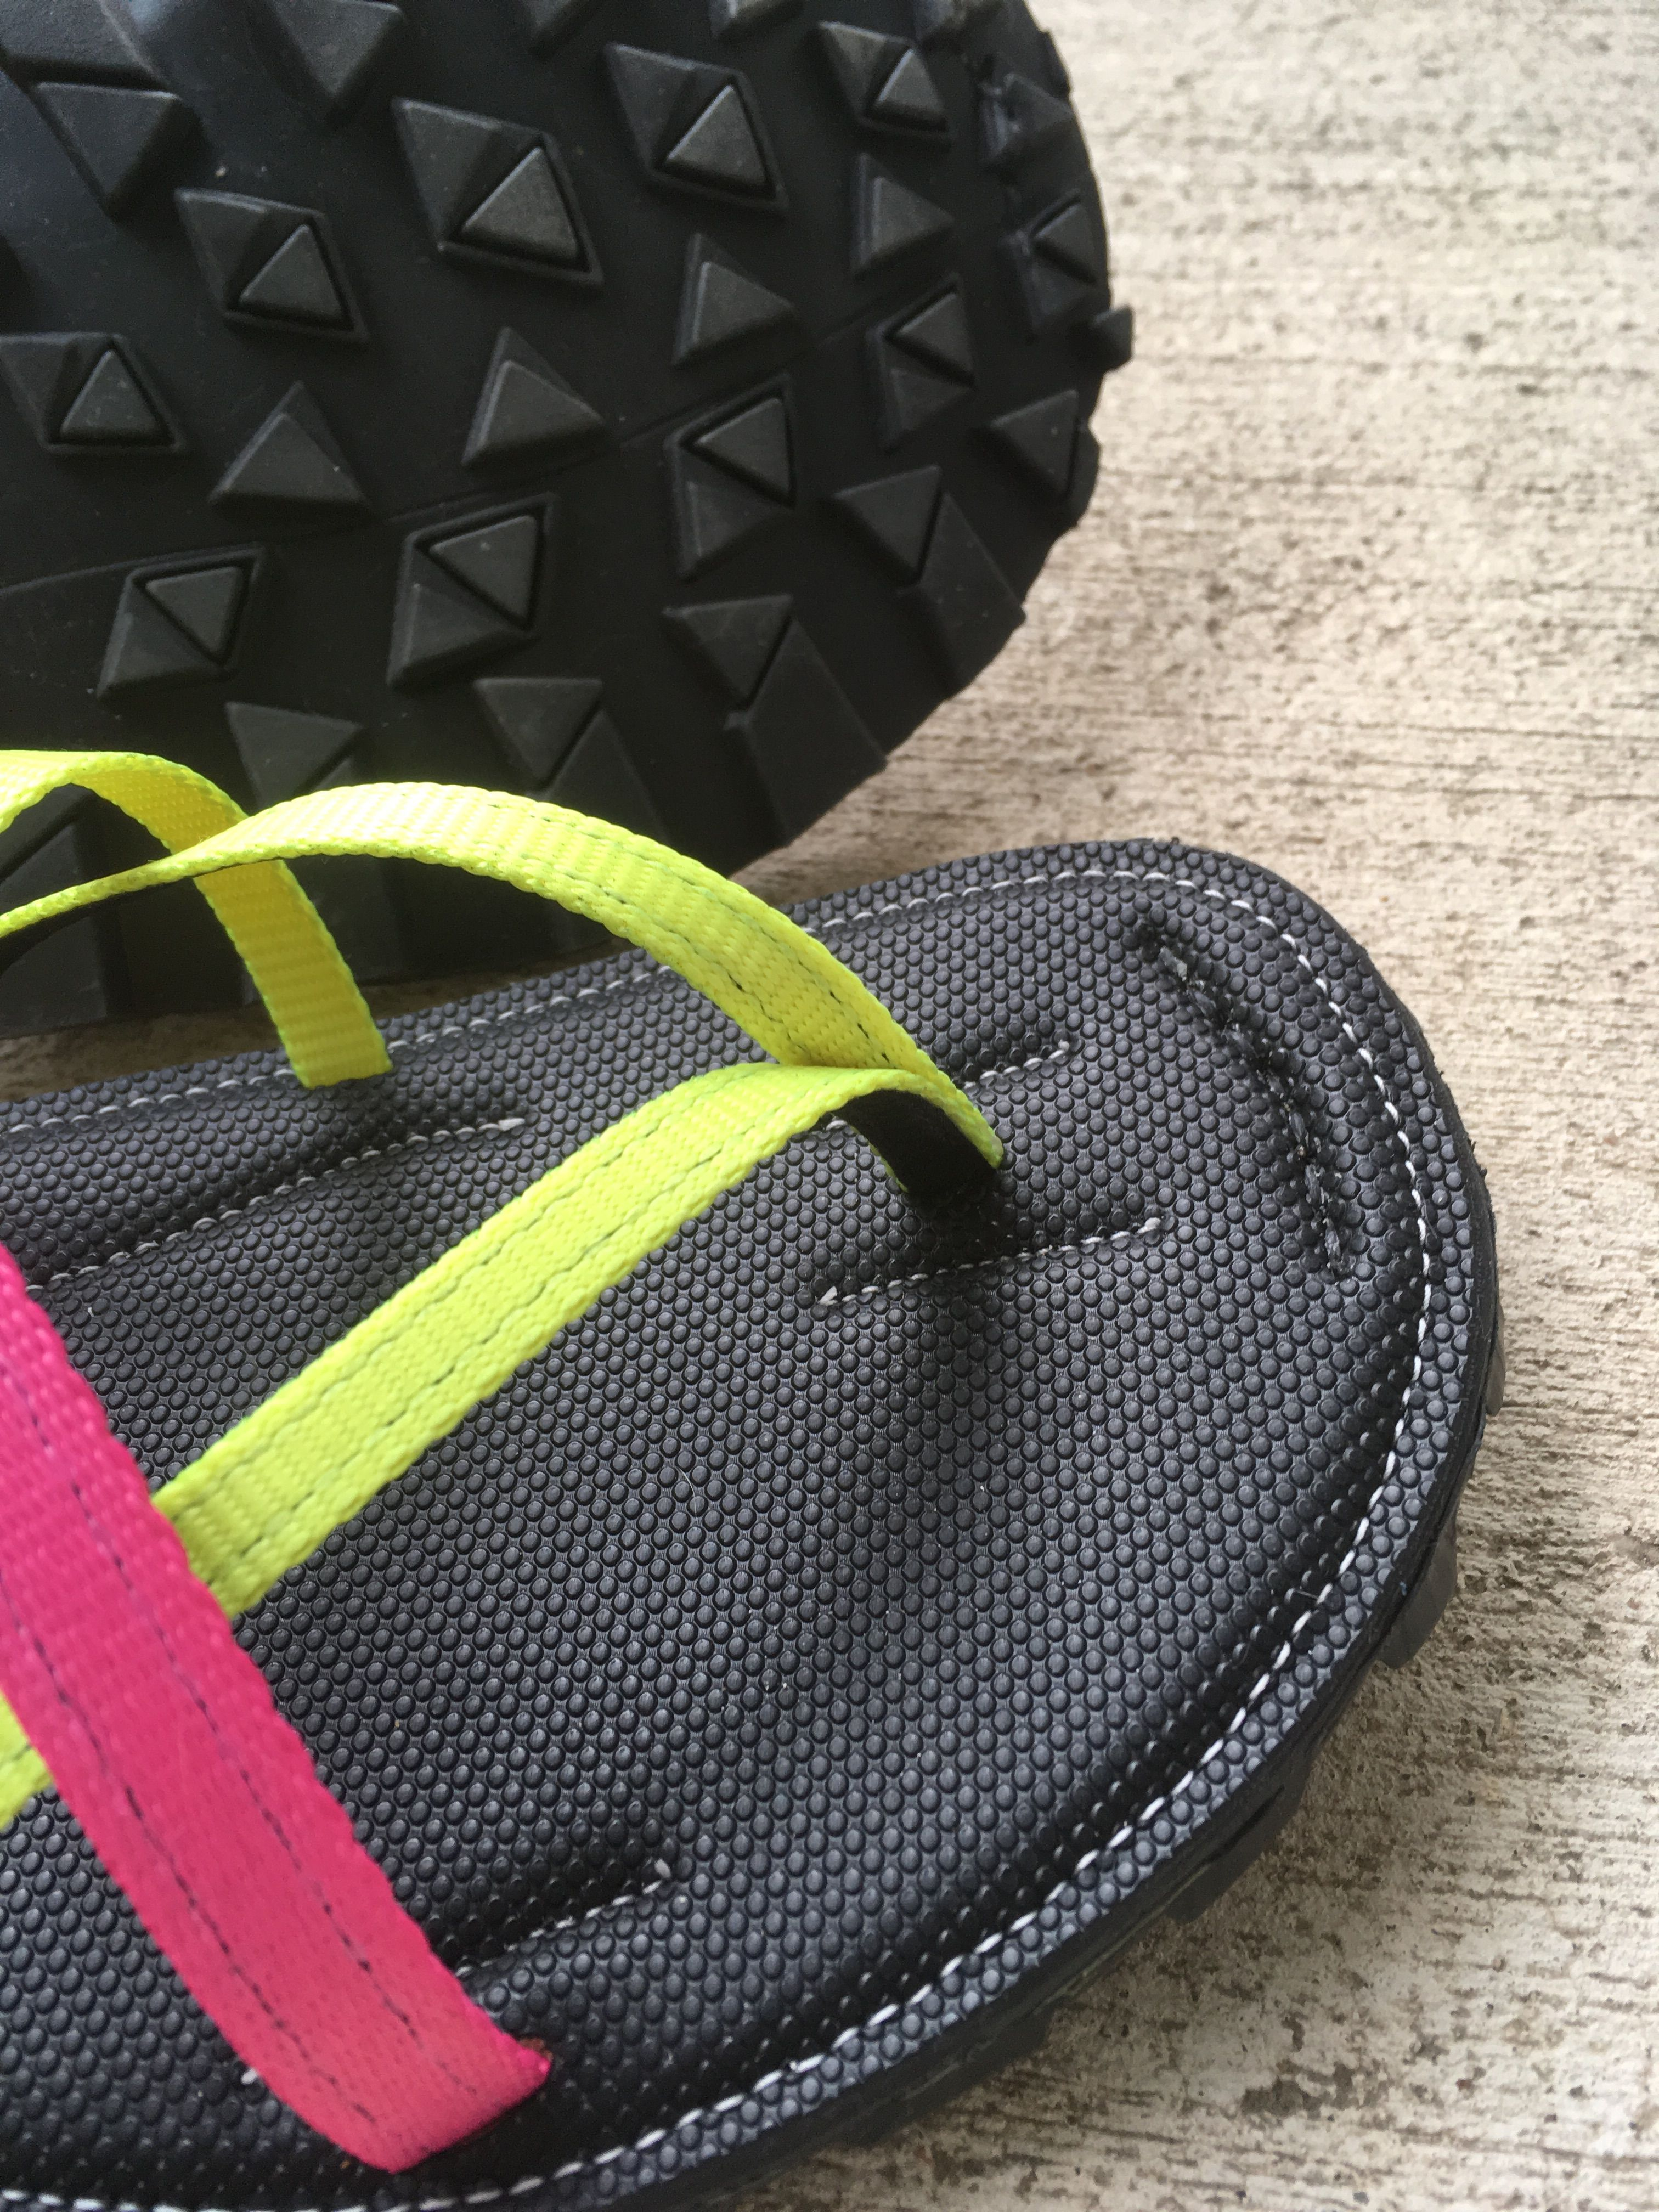 85d54475fa65e9 Pin von Rene Prange auf Barefoot Schuhe